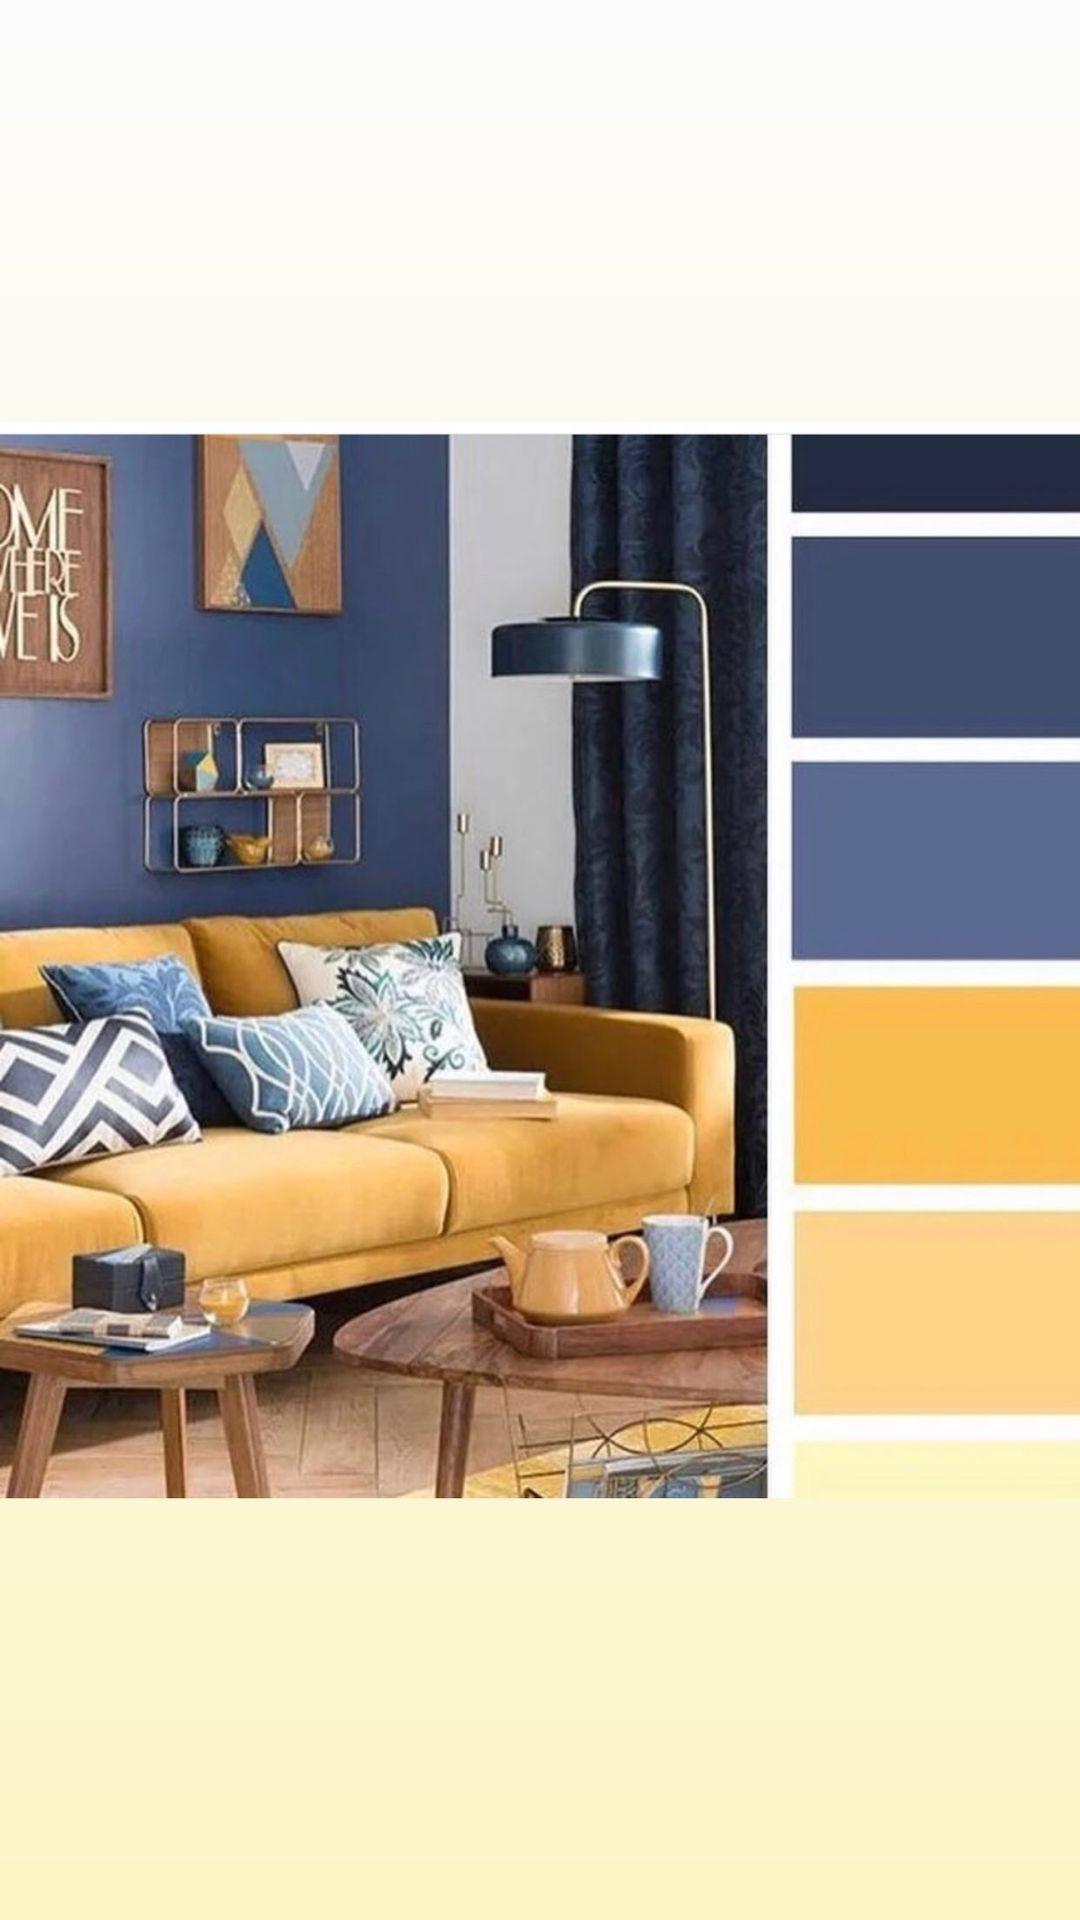 تنسيق الوان الملابس Color Wheel Basic Design Principles Color